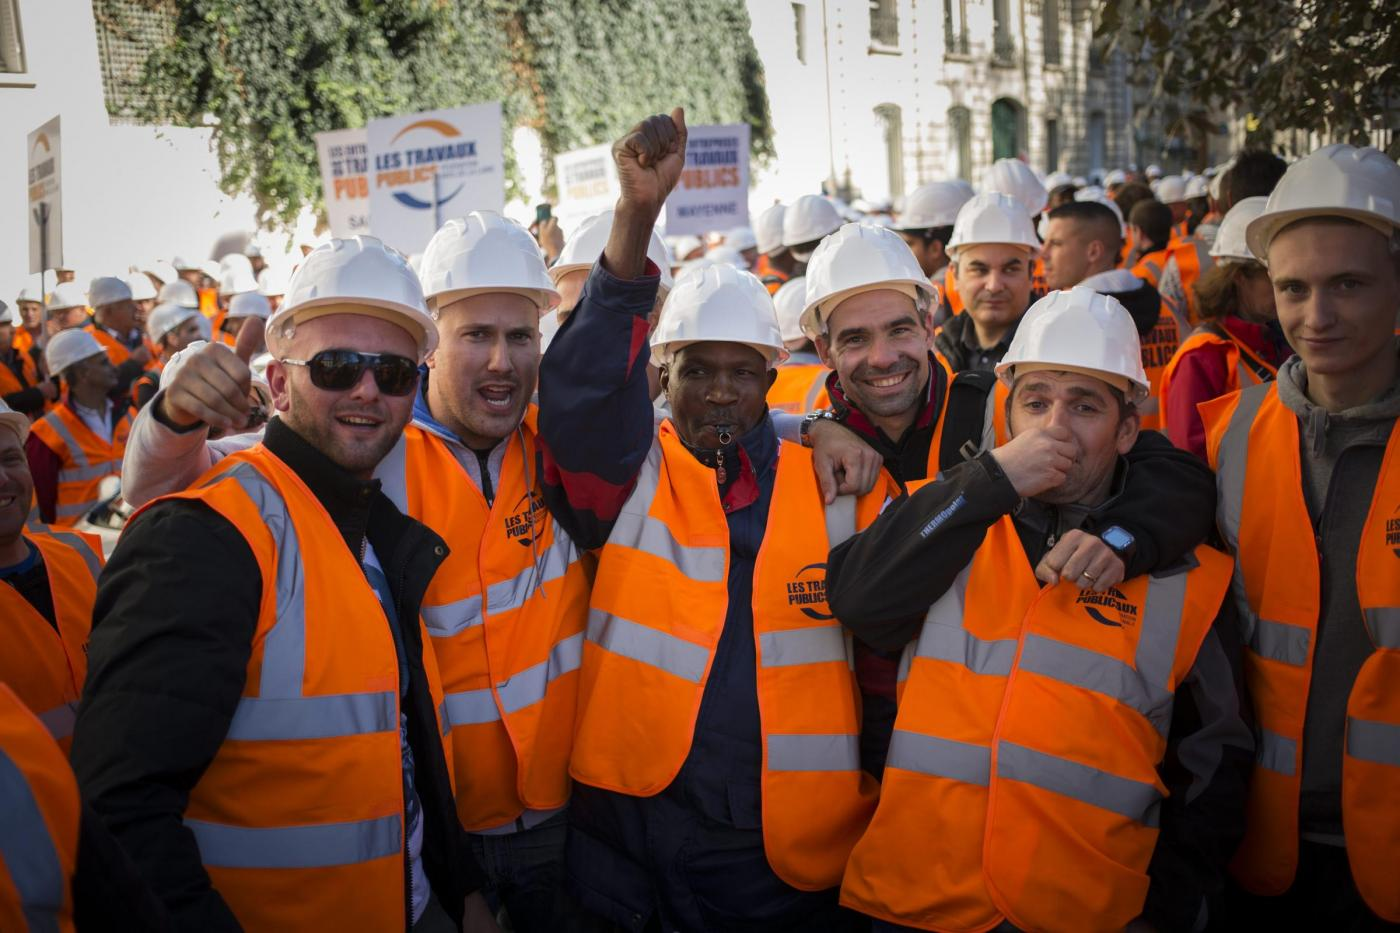 Parigi manifestazione dei lavoratori